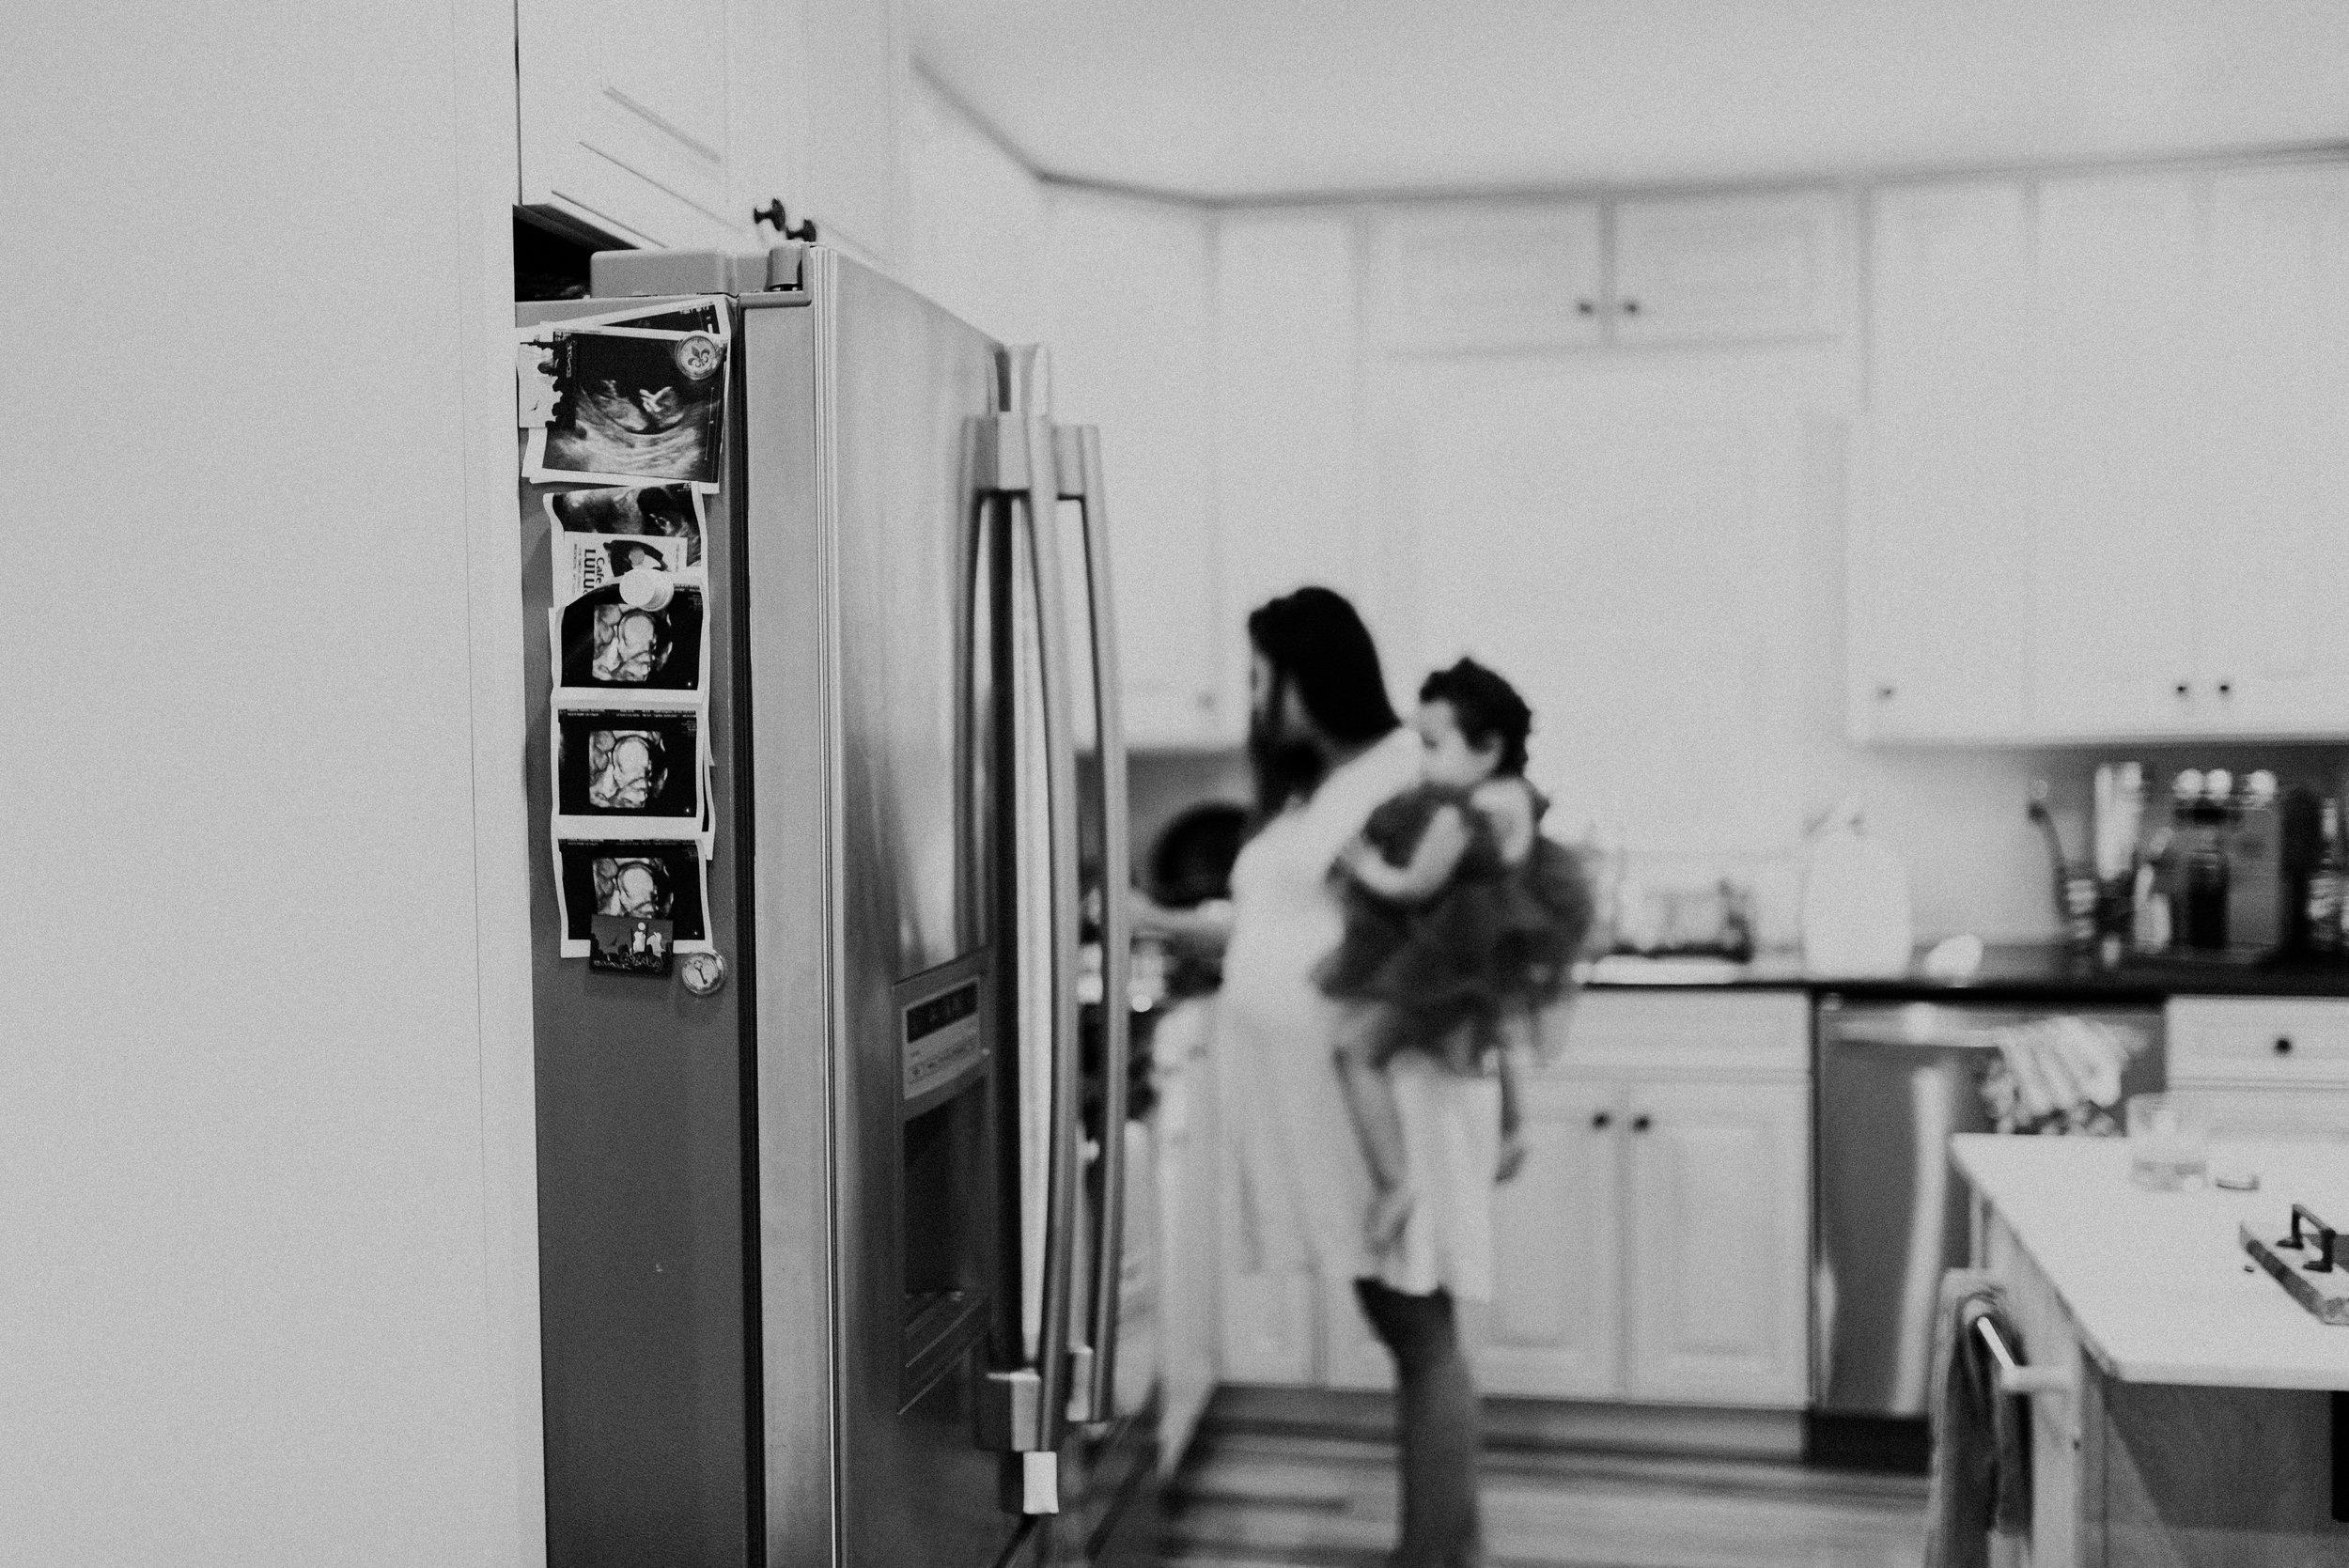 Ehrman-Massachusetts-In Home Lifestyle Maternity Session-Documentary Family Photographer-83.jpg